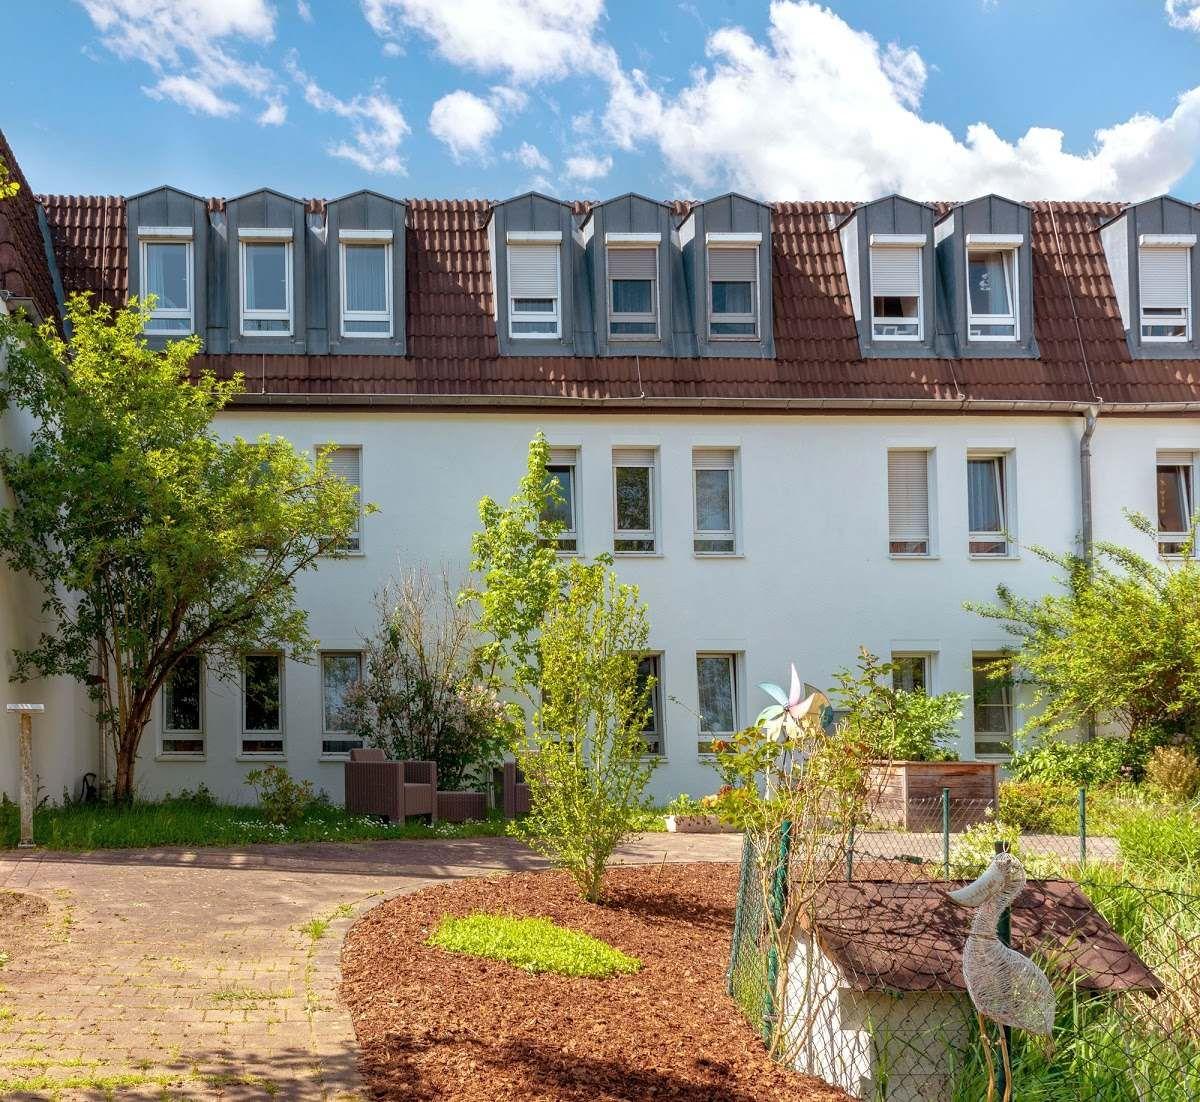 Johanniter Haus